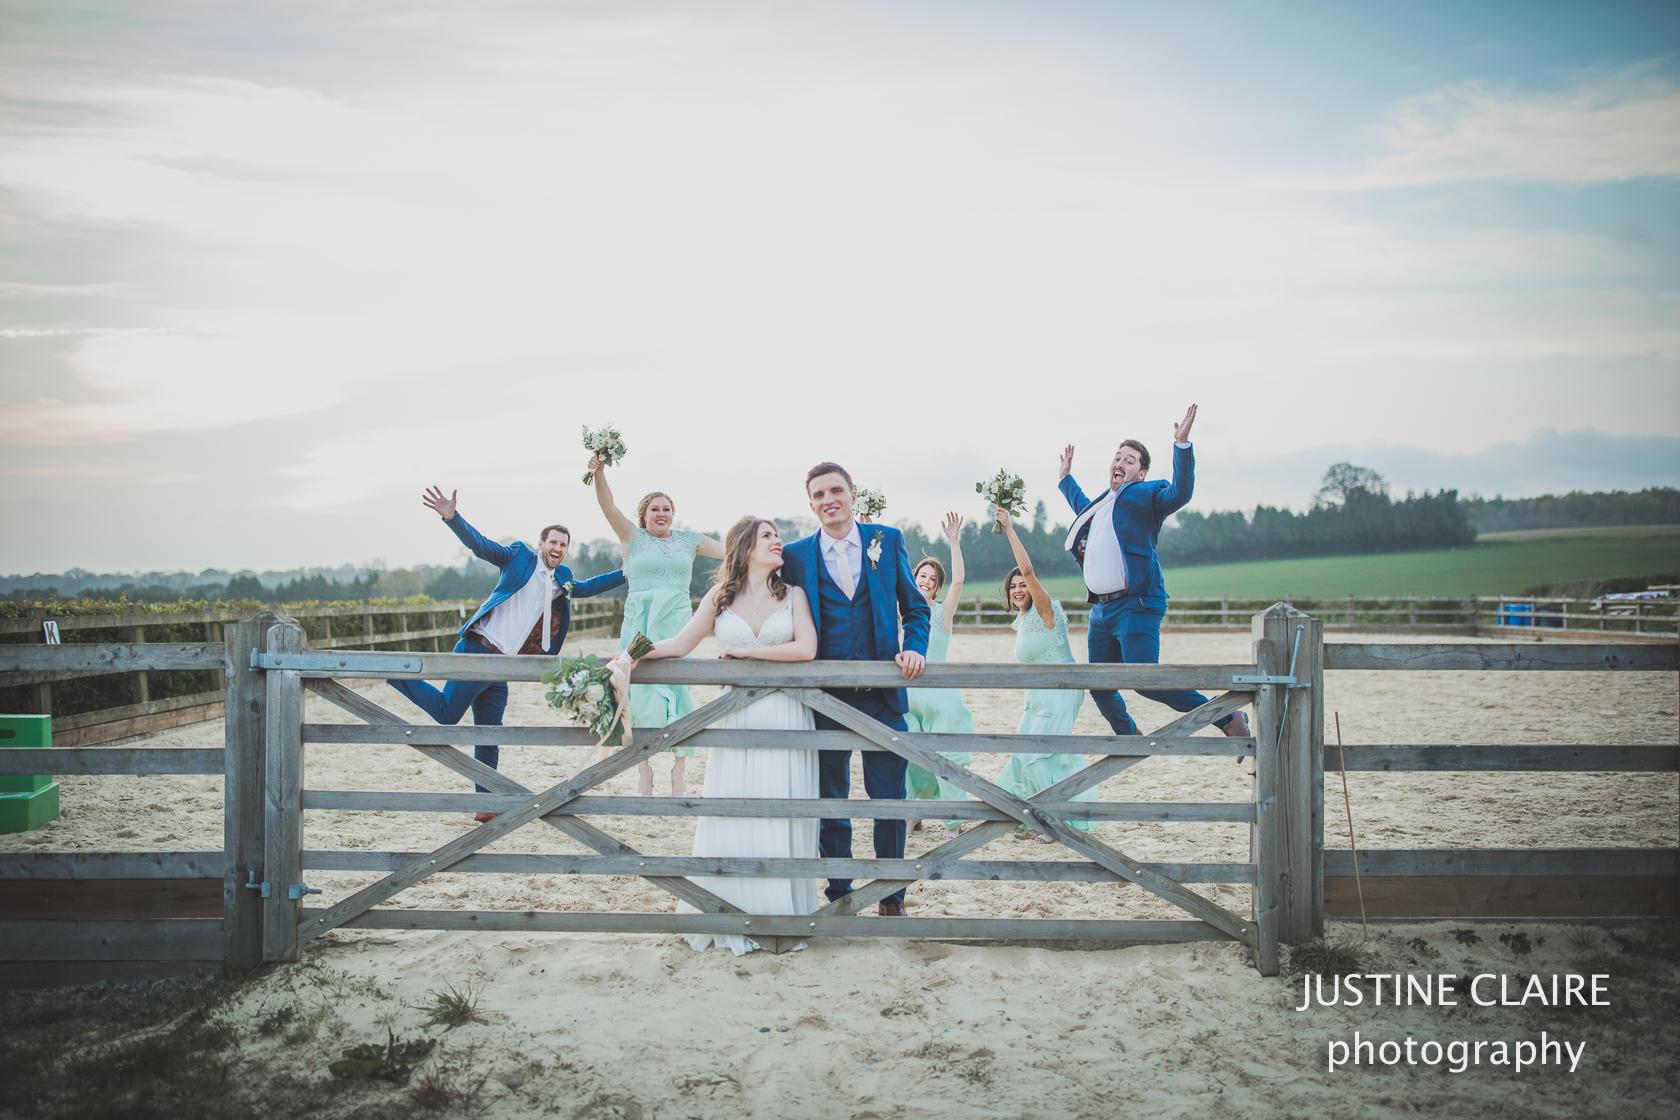 Fitzleroi Fittleworth petworth Billingshurst farm Wedding Photography by Justine Claire photographer Arundel Worthing Brighton-63.jpg